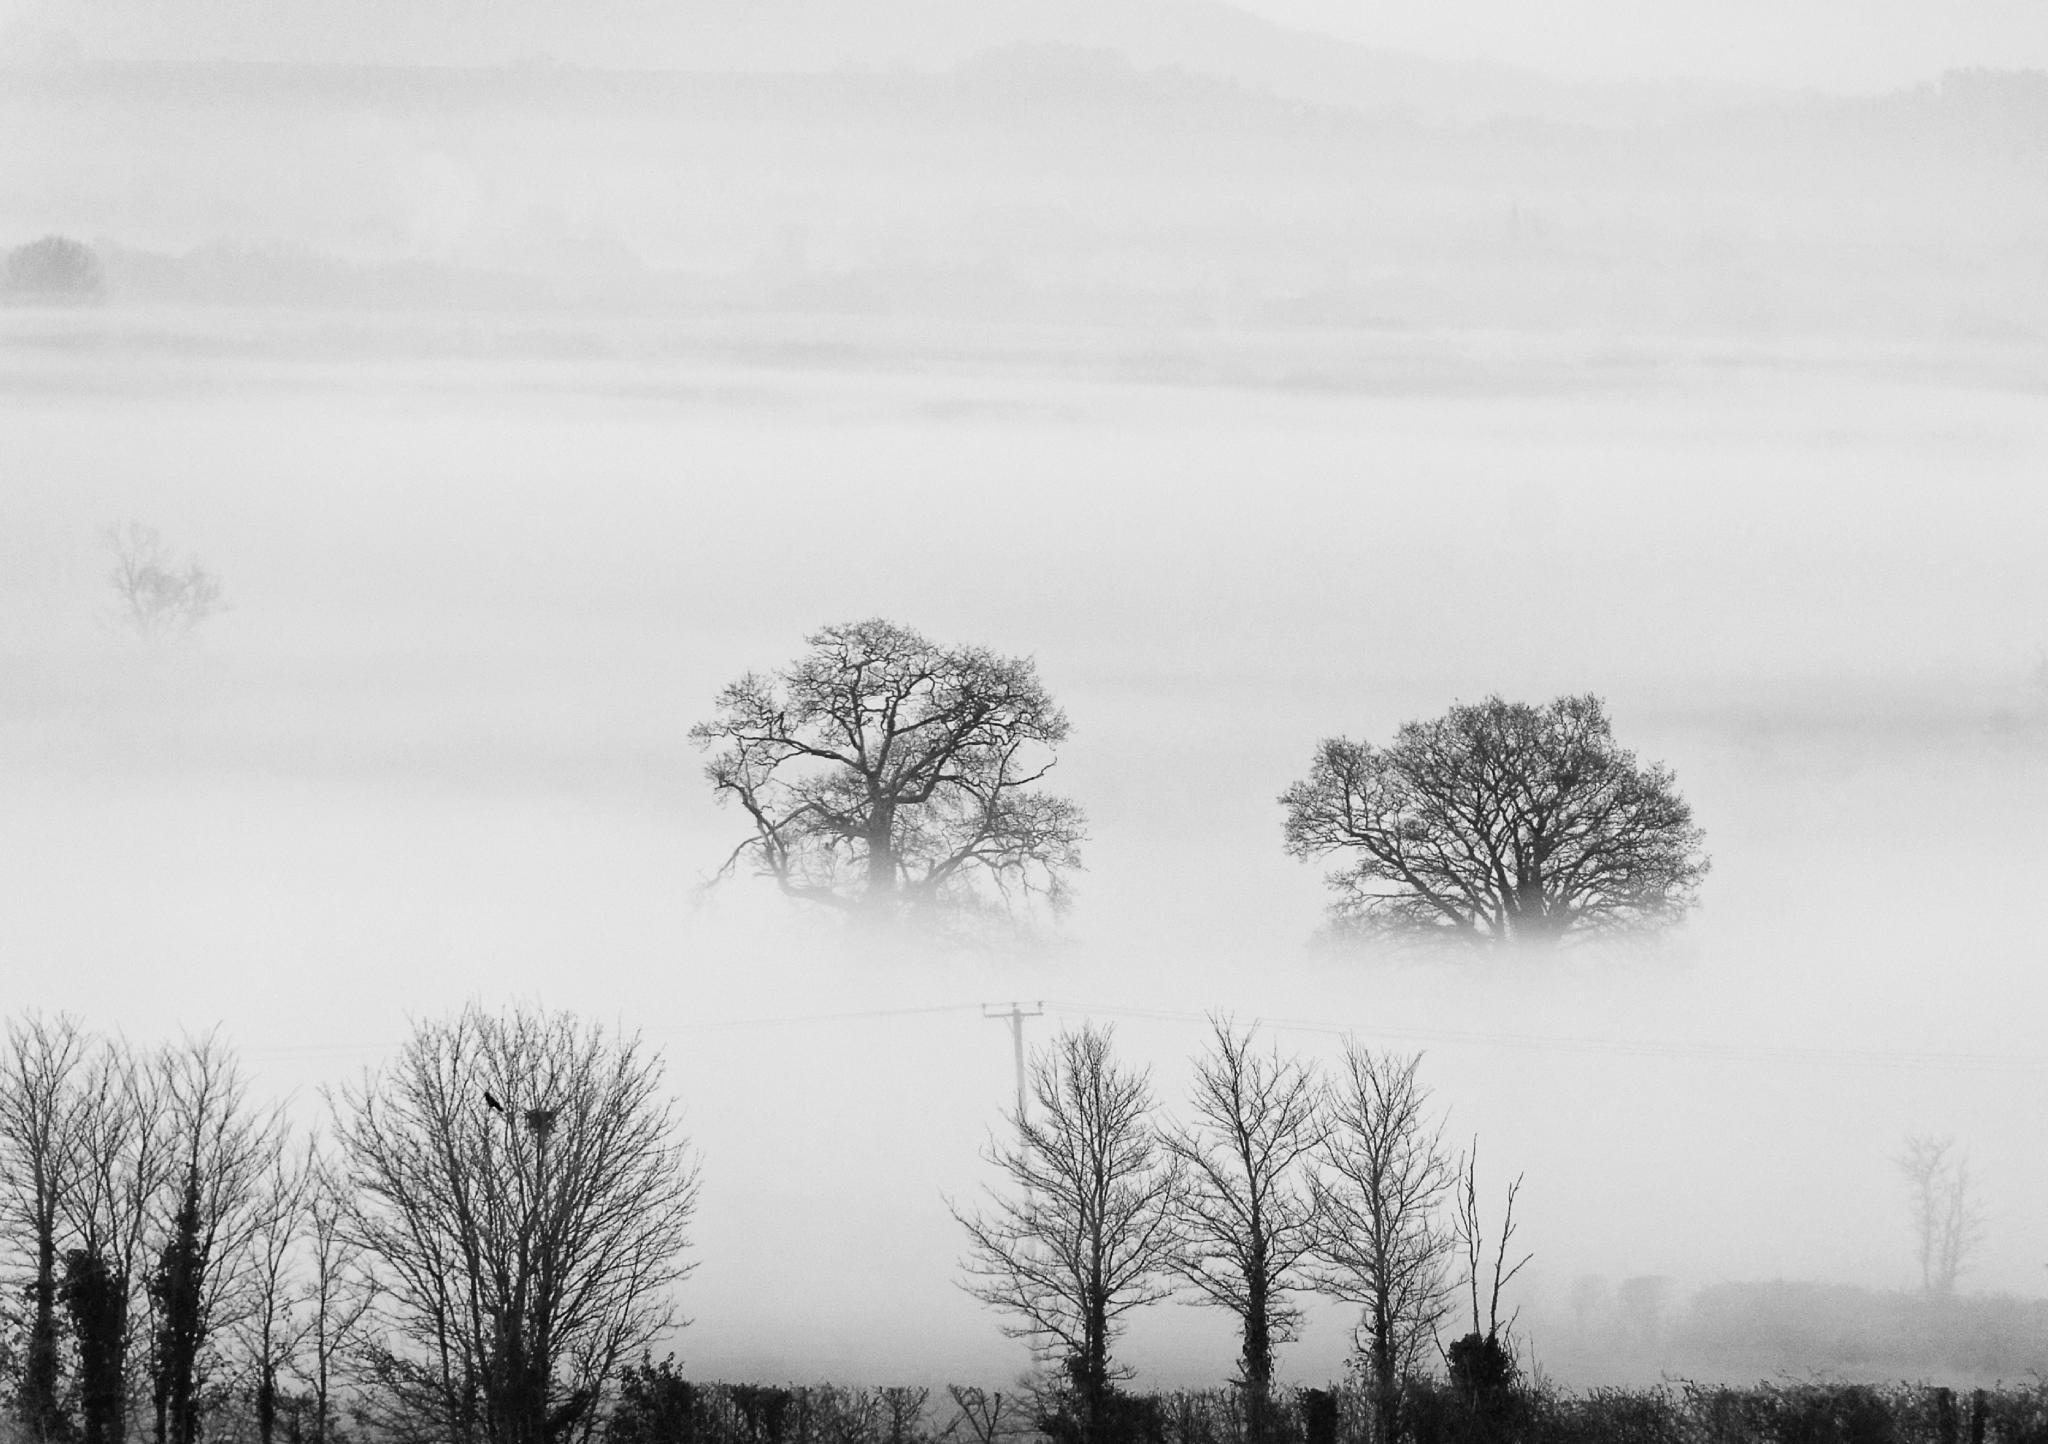 Somerset Levels - Misty Morning by GeraldGraves